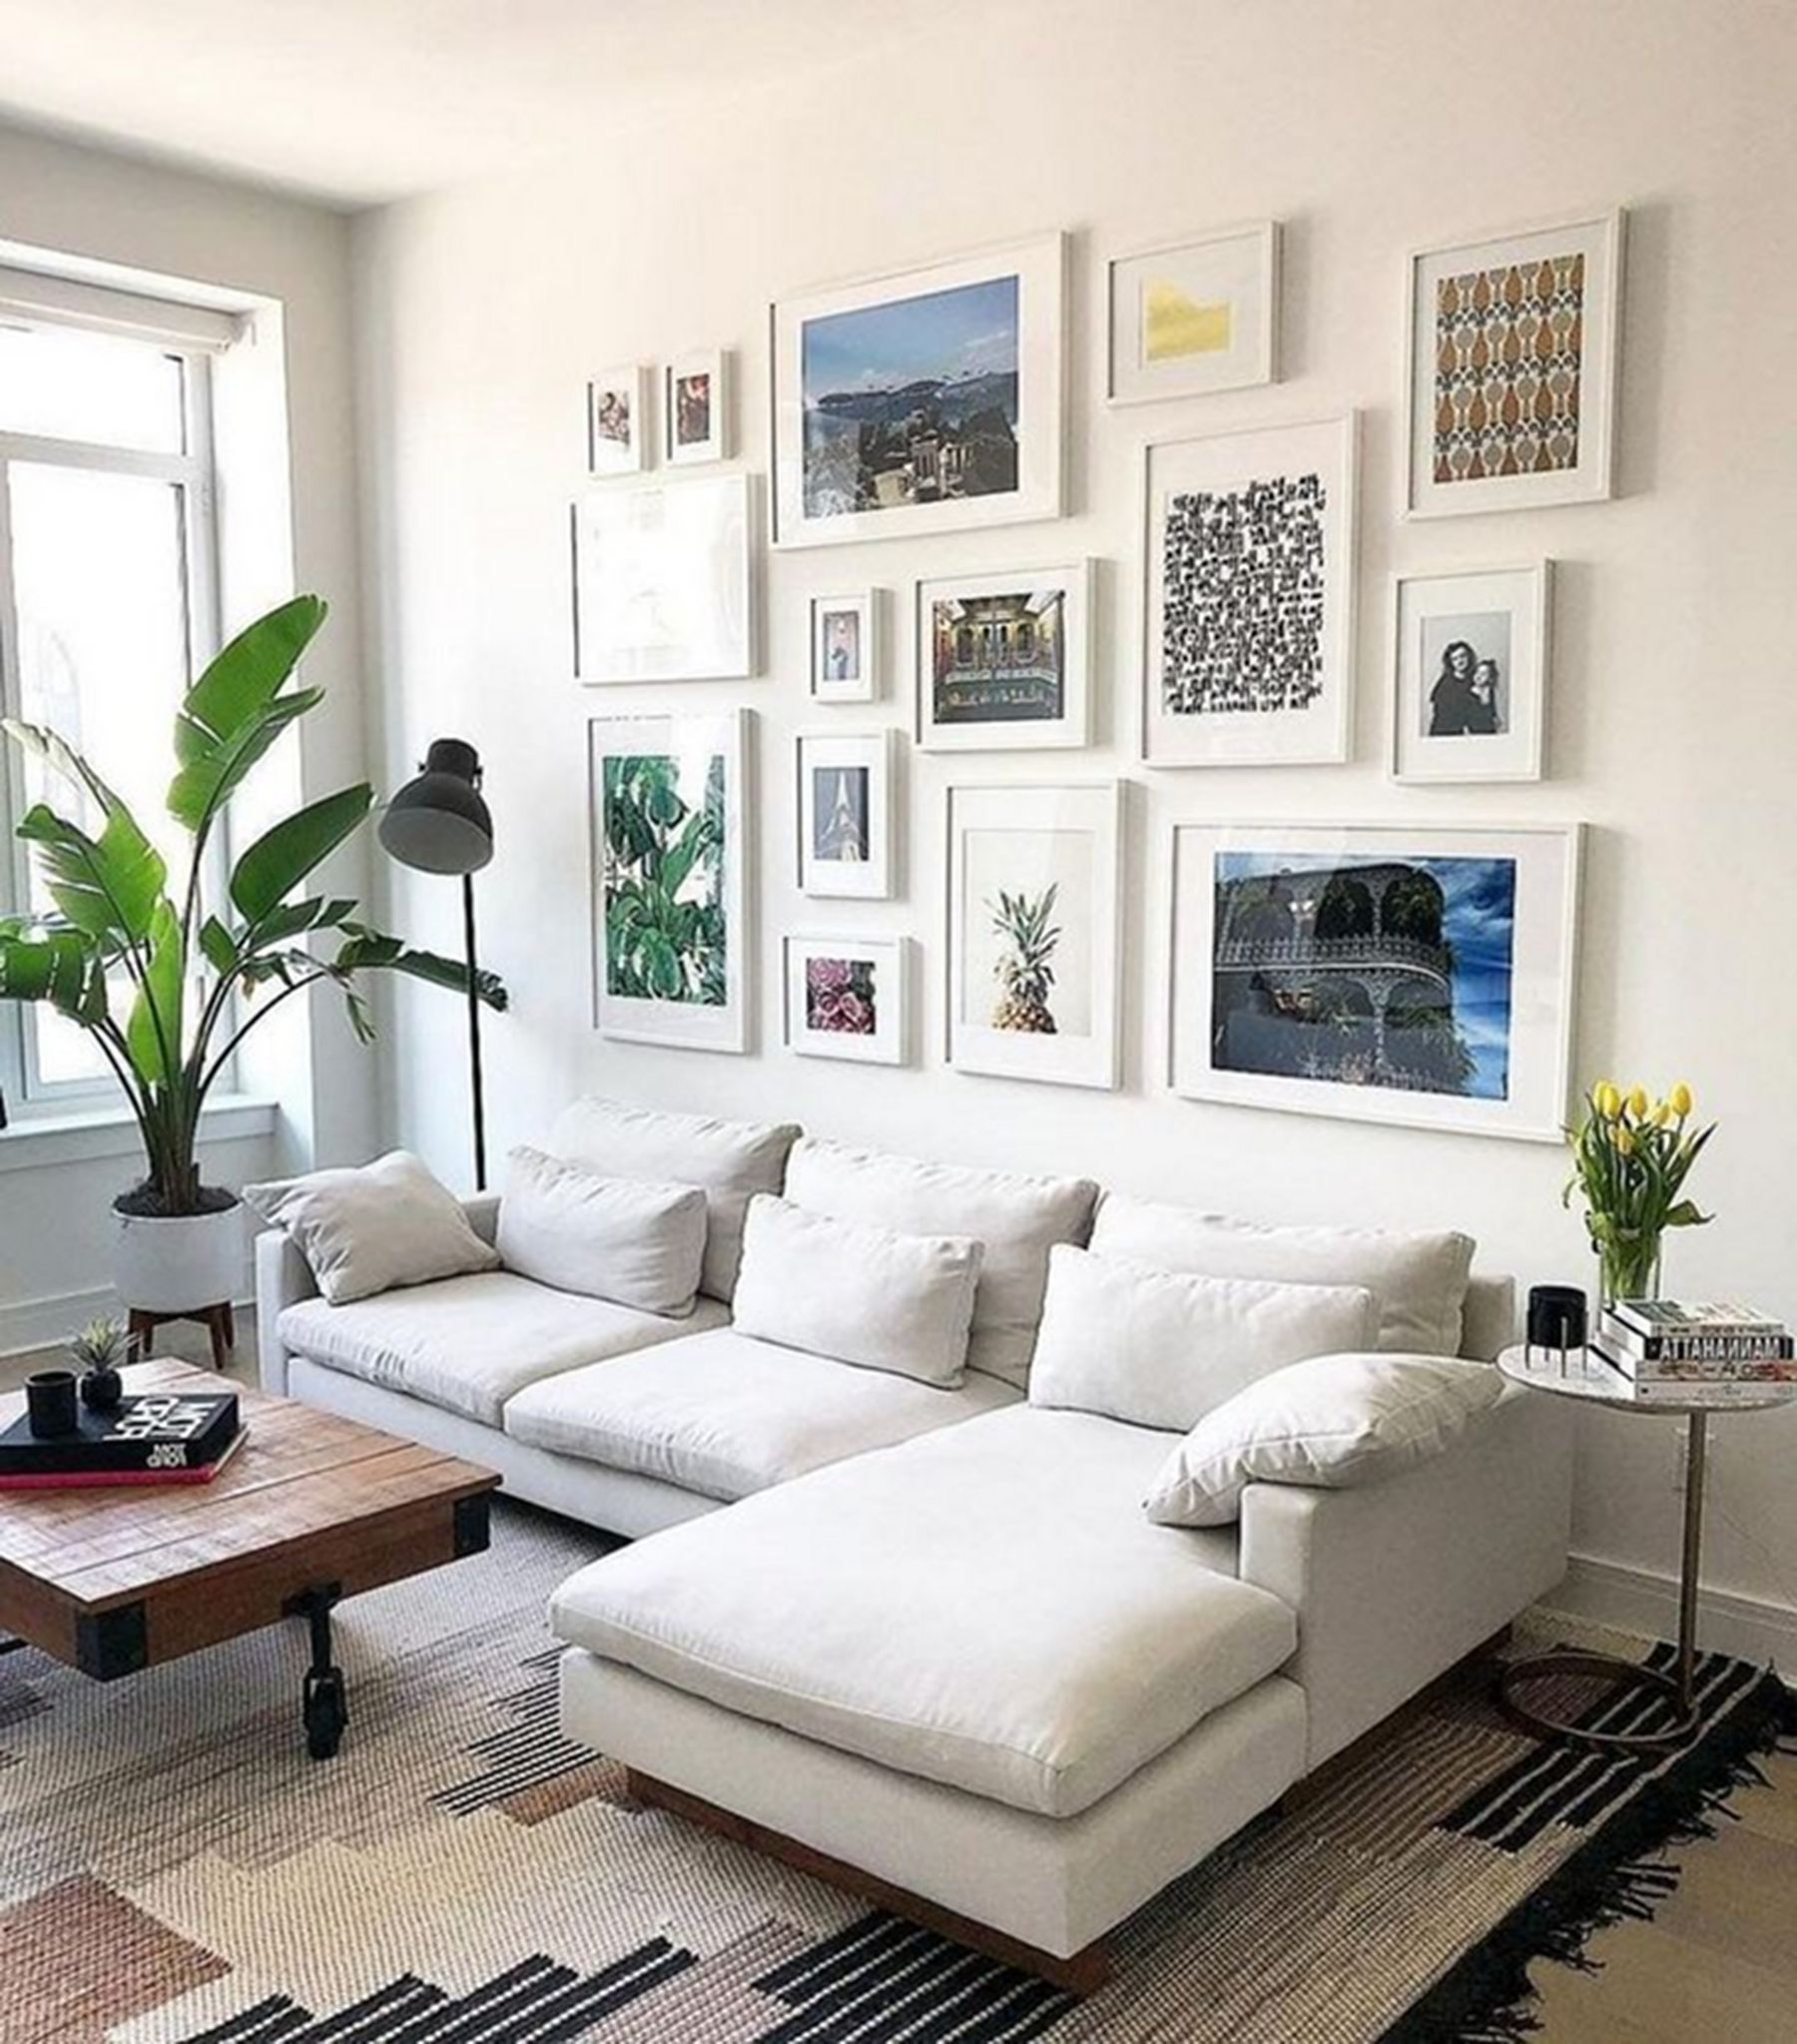 10 beautiful scandinavian living room design ideas to